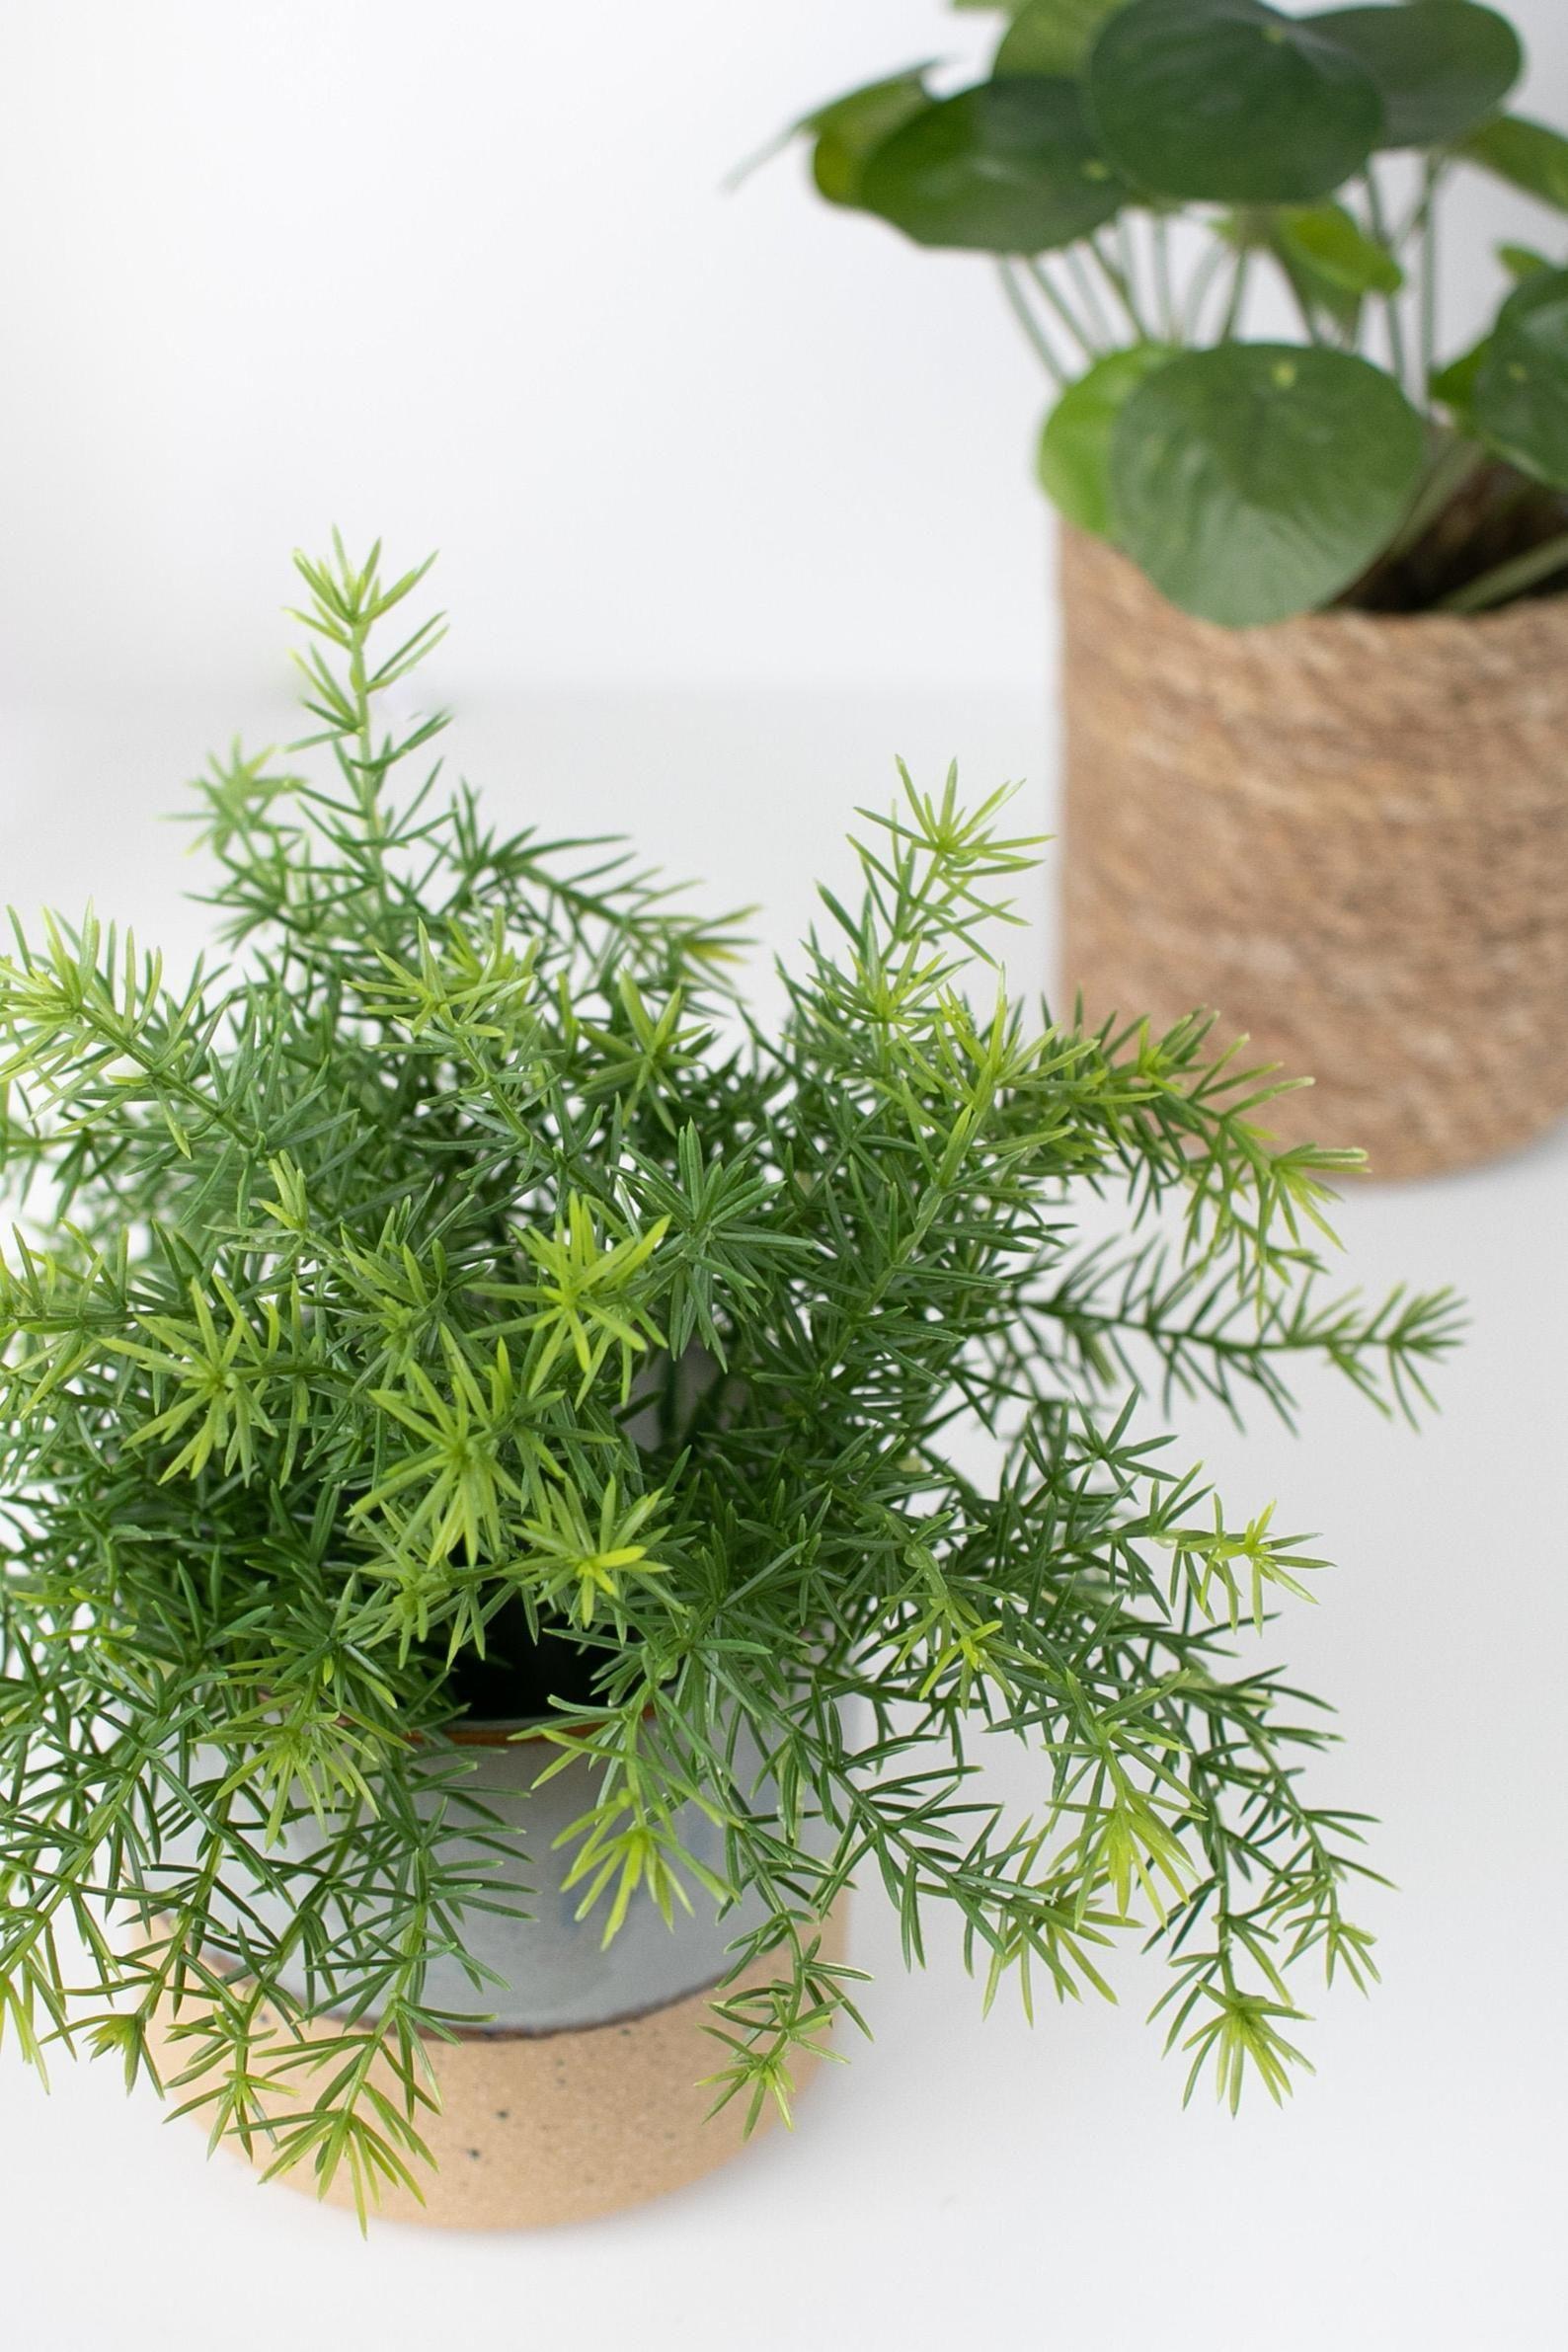 Asparagus Fern Artificial Plant Cute Bushy Green Houseplant Etsy In 2020 Asparagus Fern Artificial Plants Plants